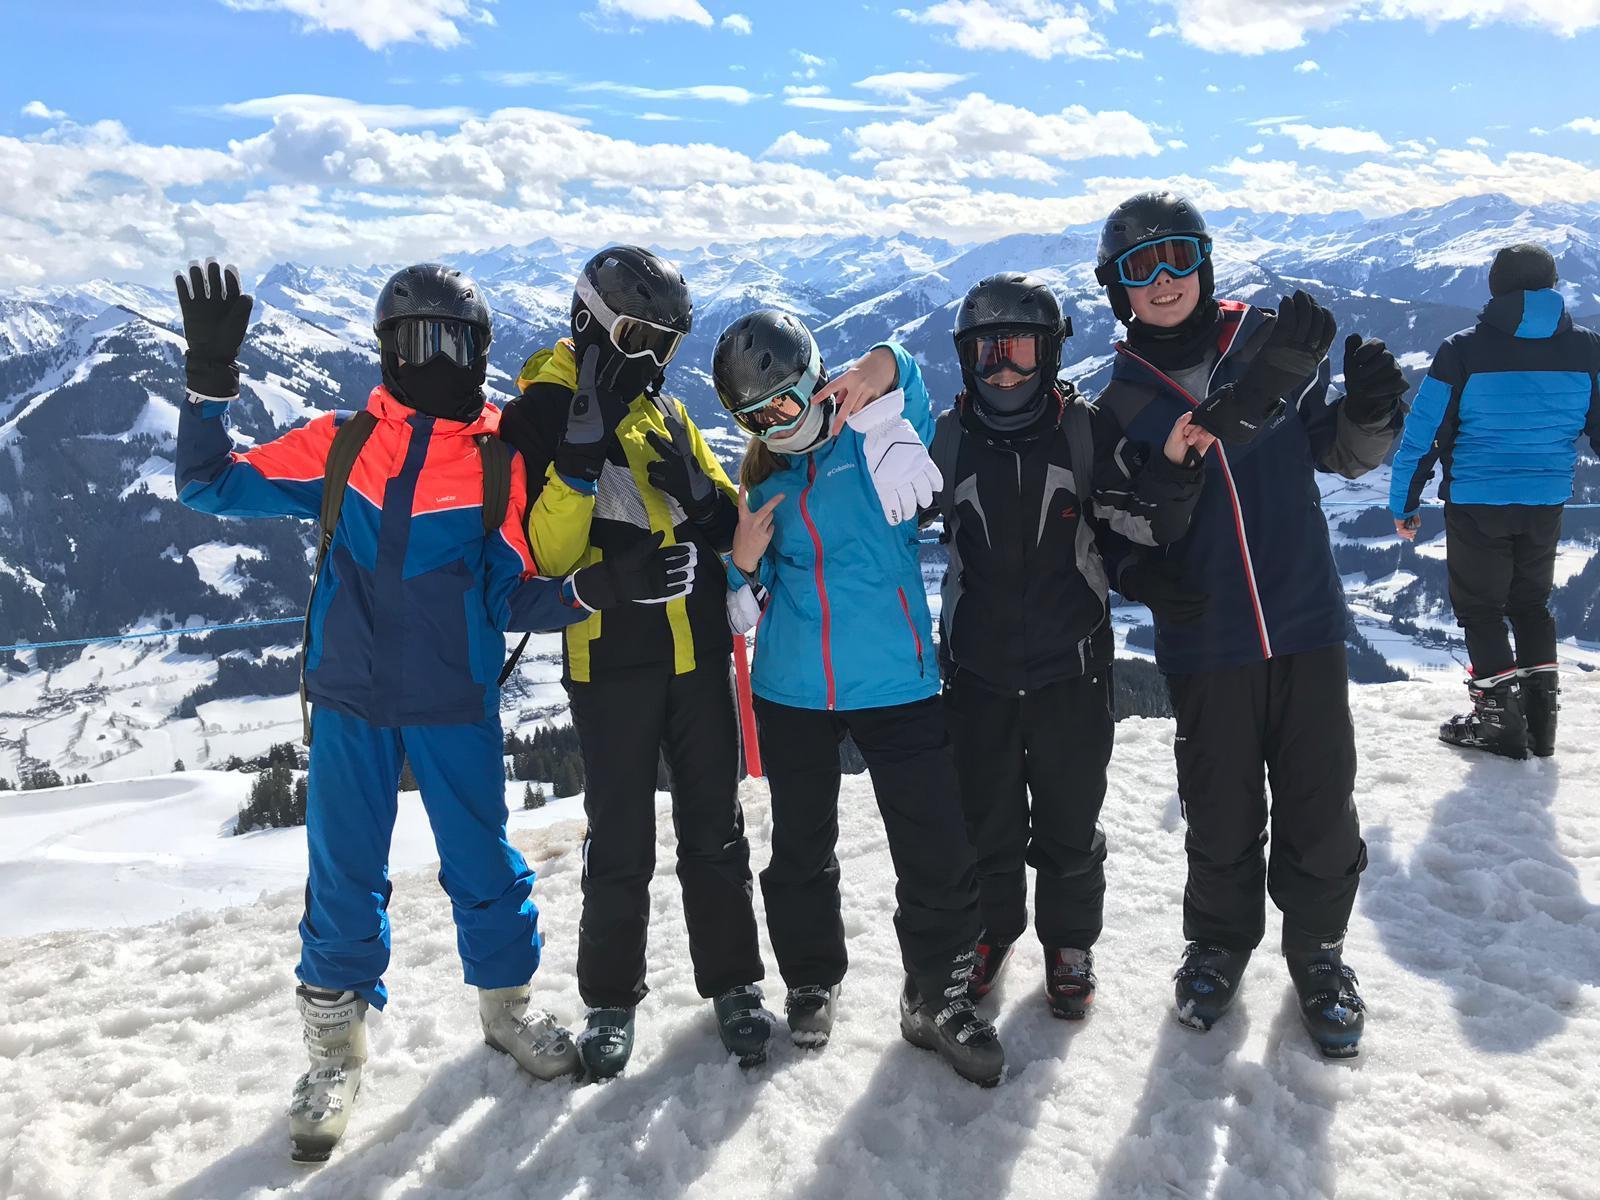 [2022] Italiaans sneeuwplezier (skiën) - Krokus - Meransen